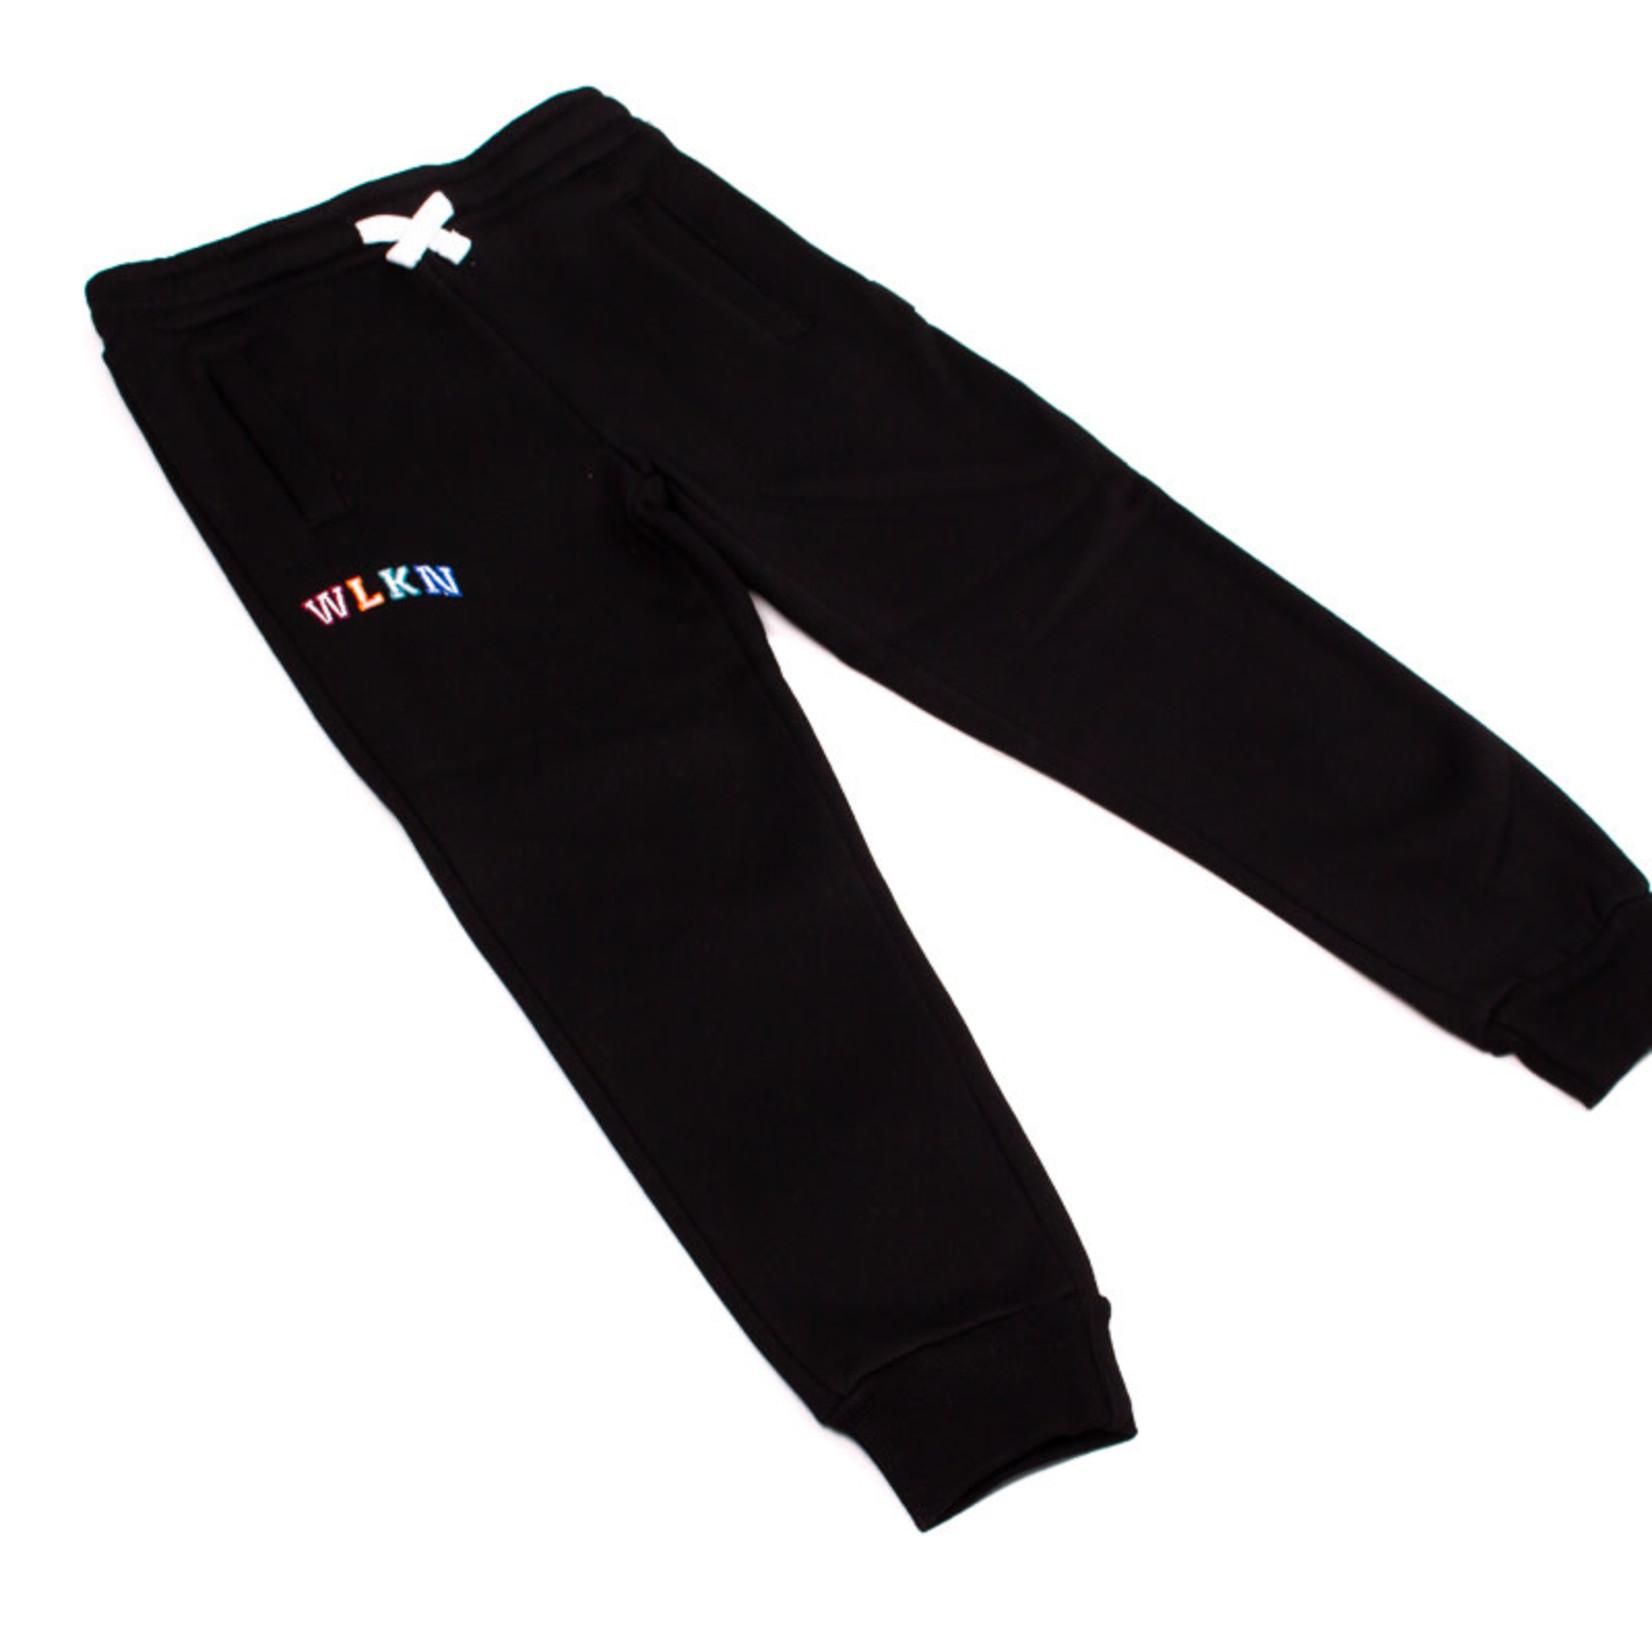 WLKN WLKN : Junior Varsity Sweatpants